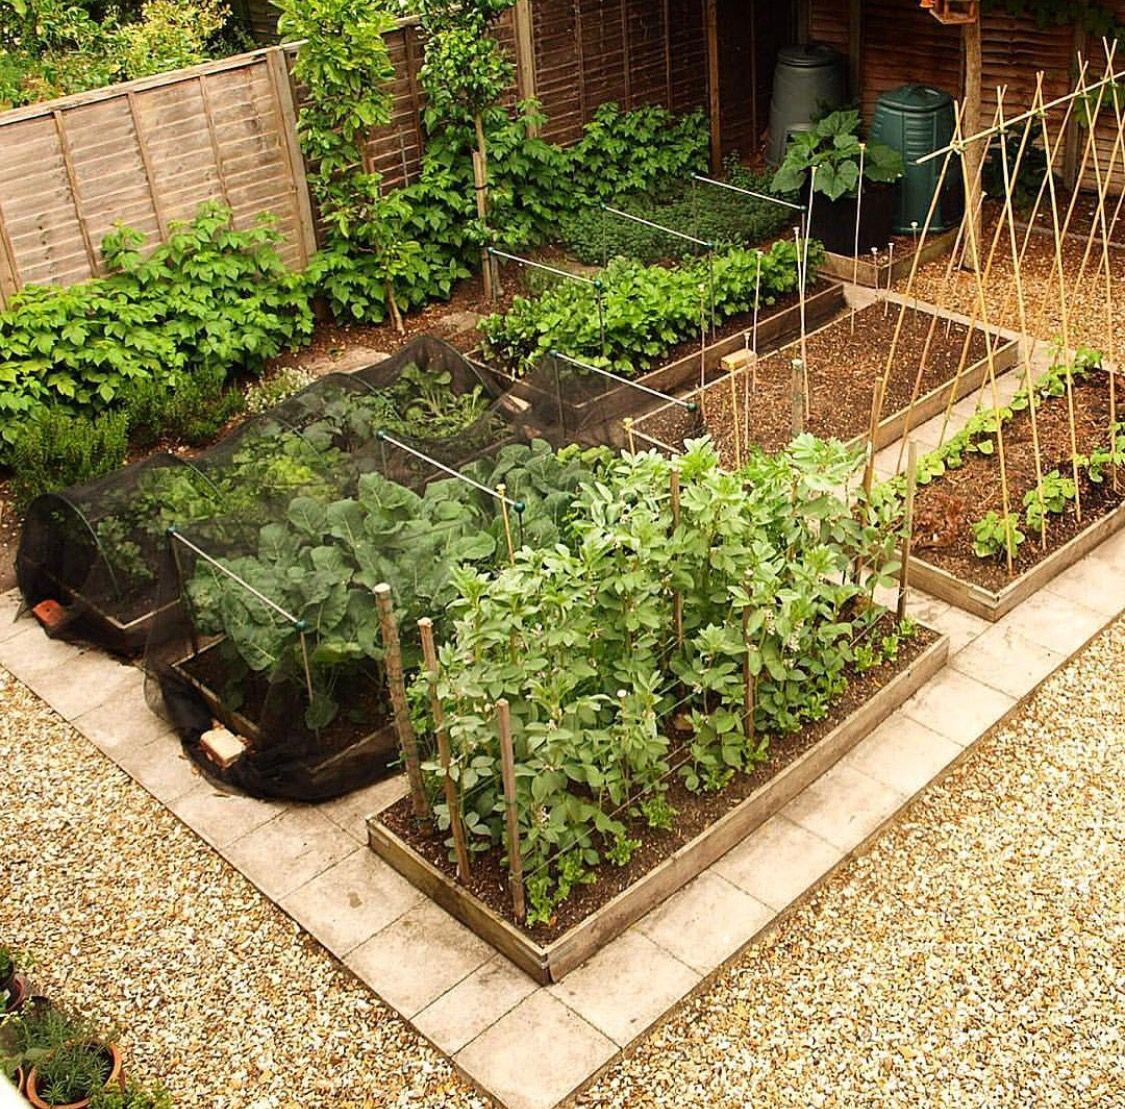 35 Advantageous Small Vegetable Garden Ideas For Your: Garden Layout Vegetable, Vegetable Garden